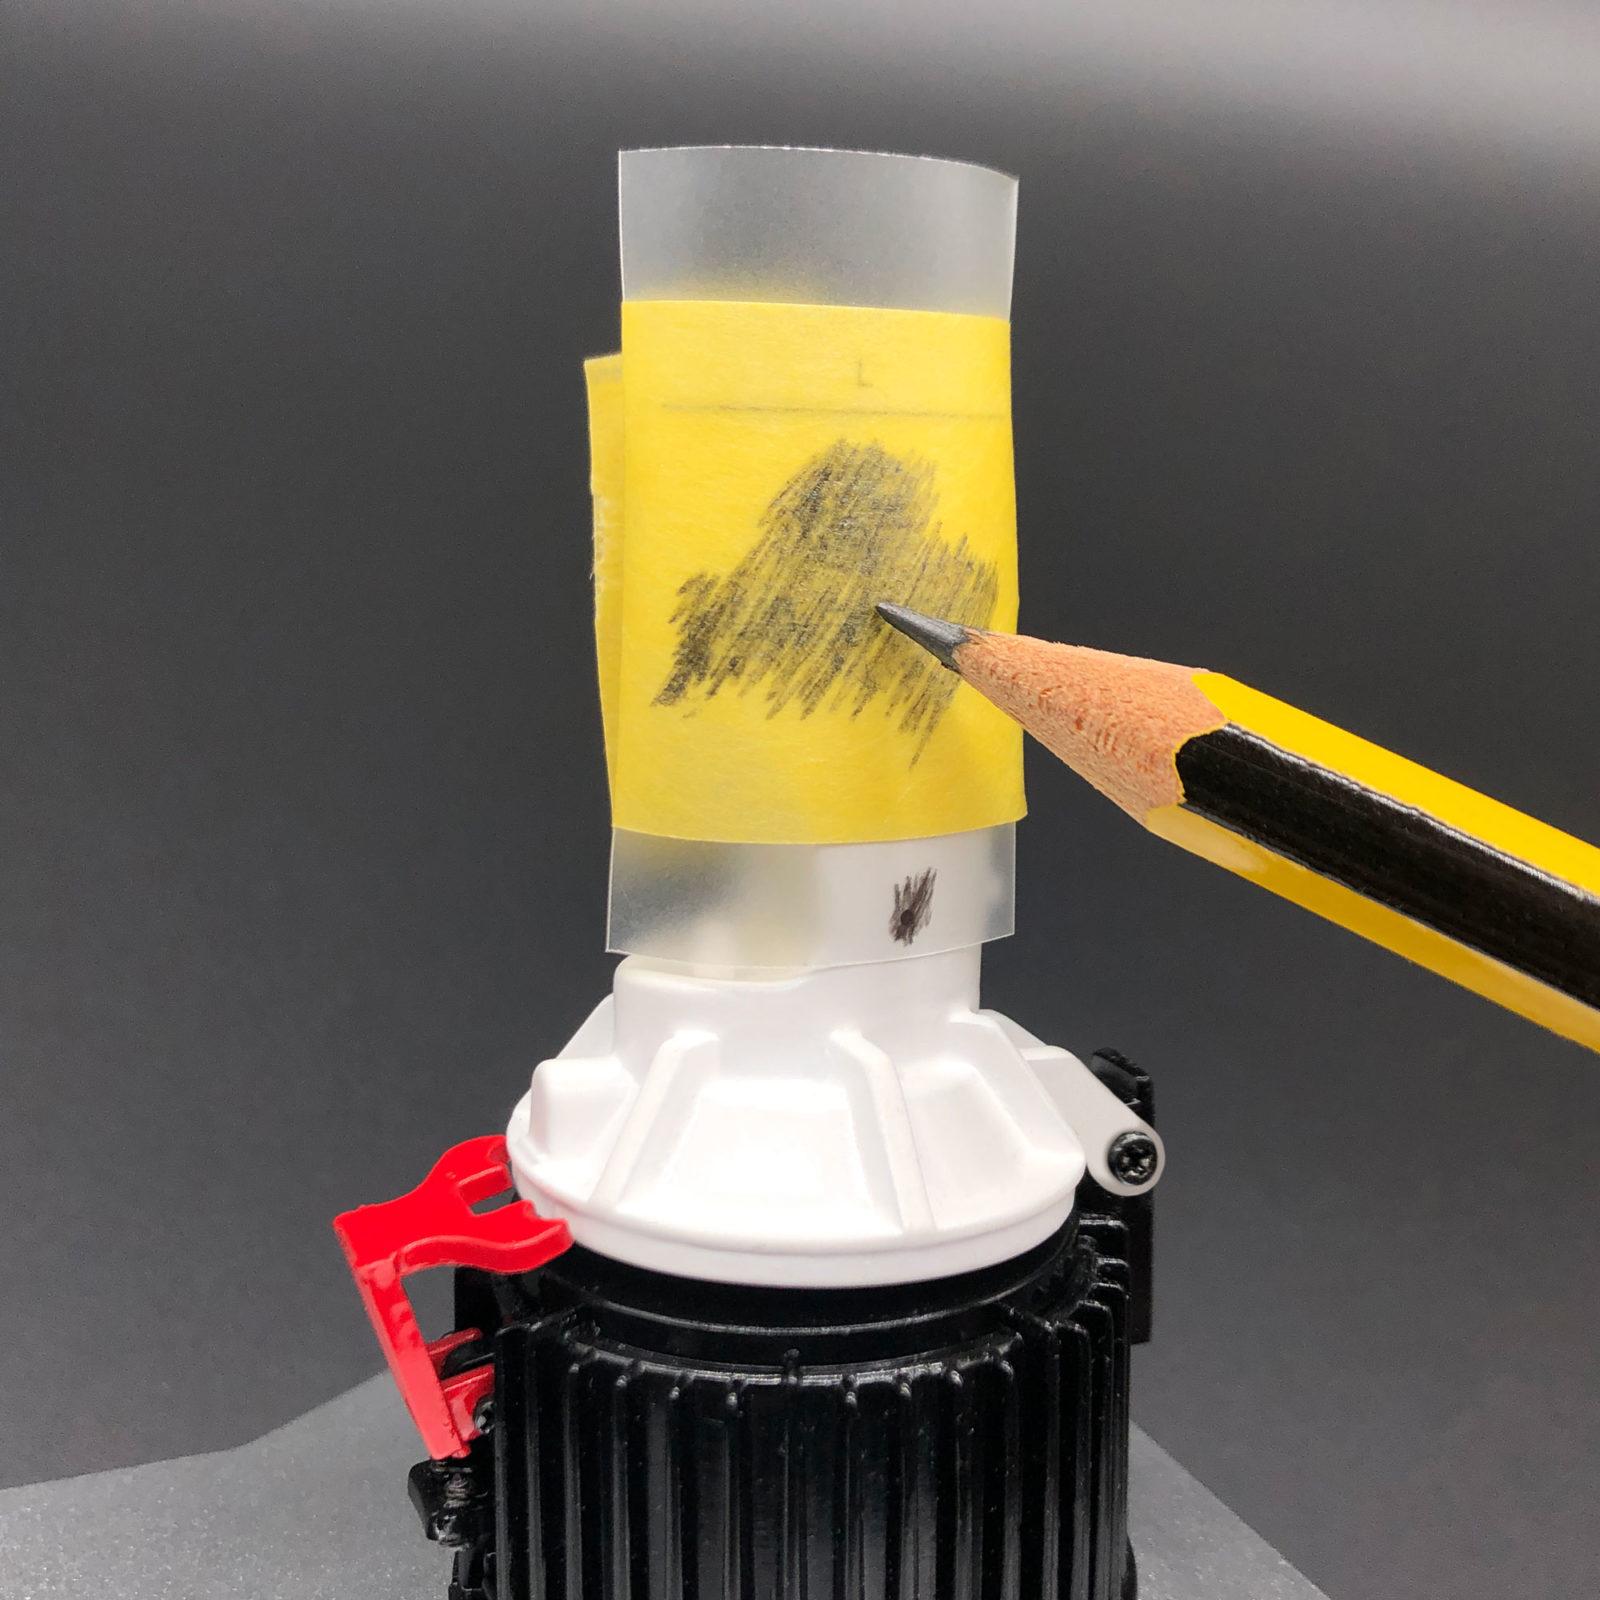 Applying Mr Fusion Transfer application using a pencil